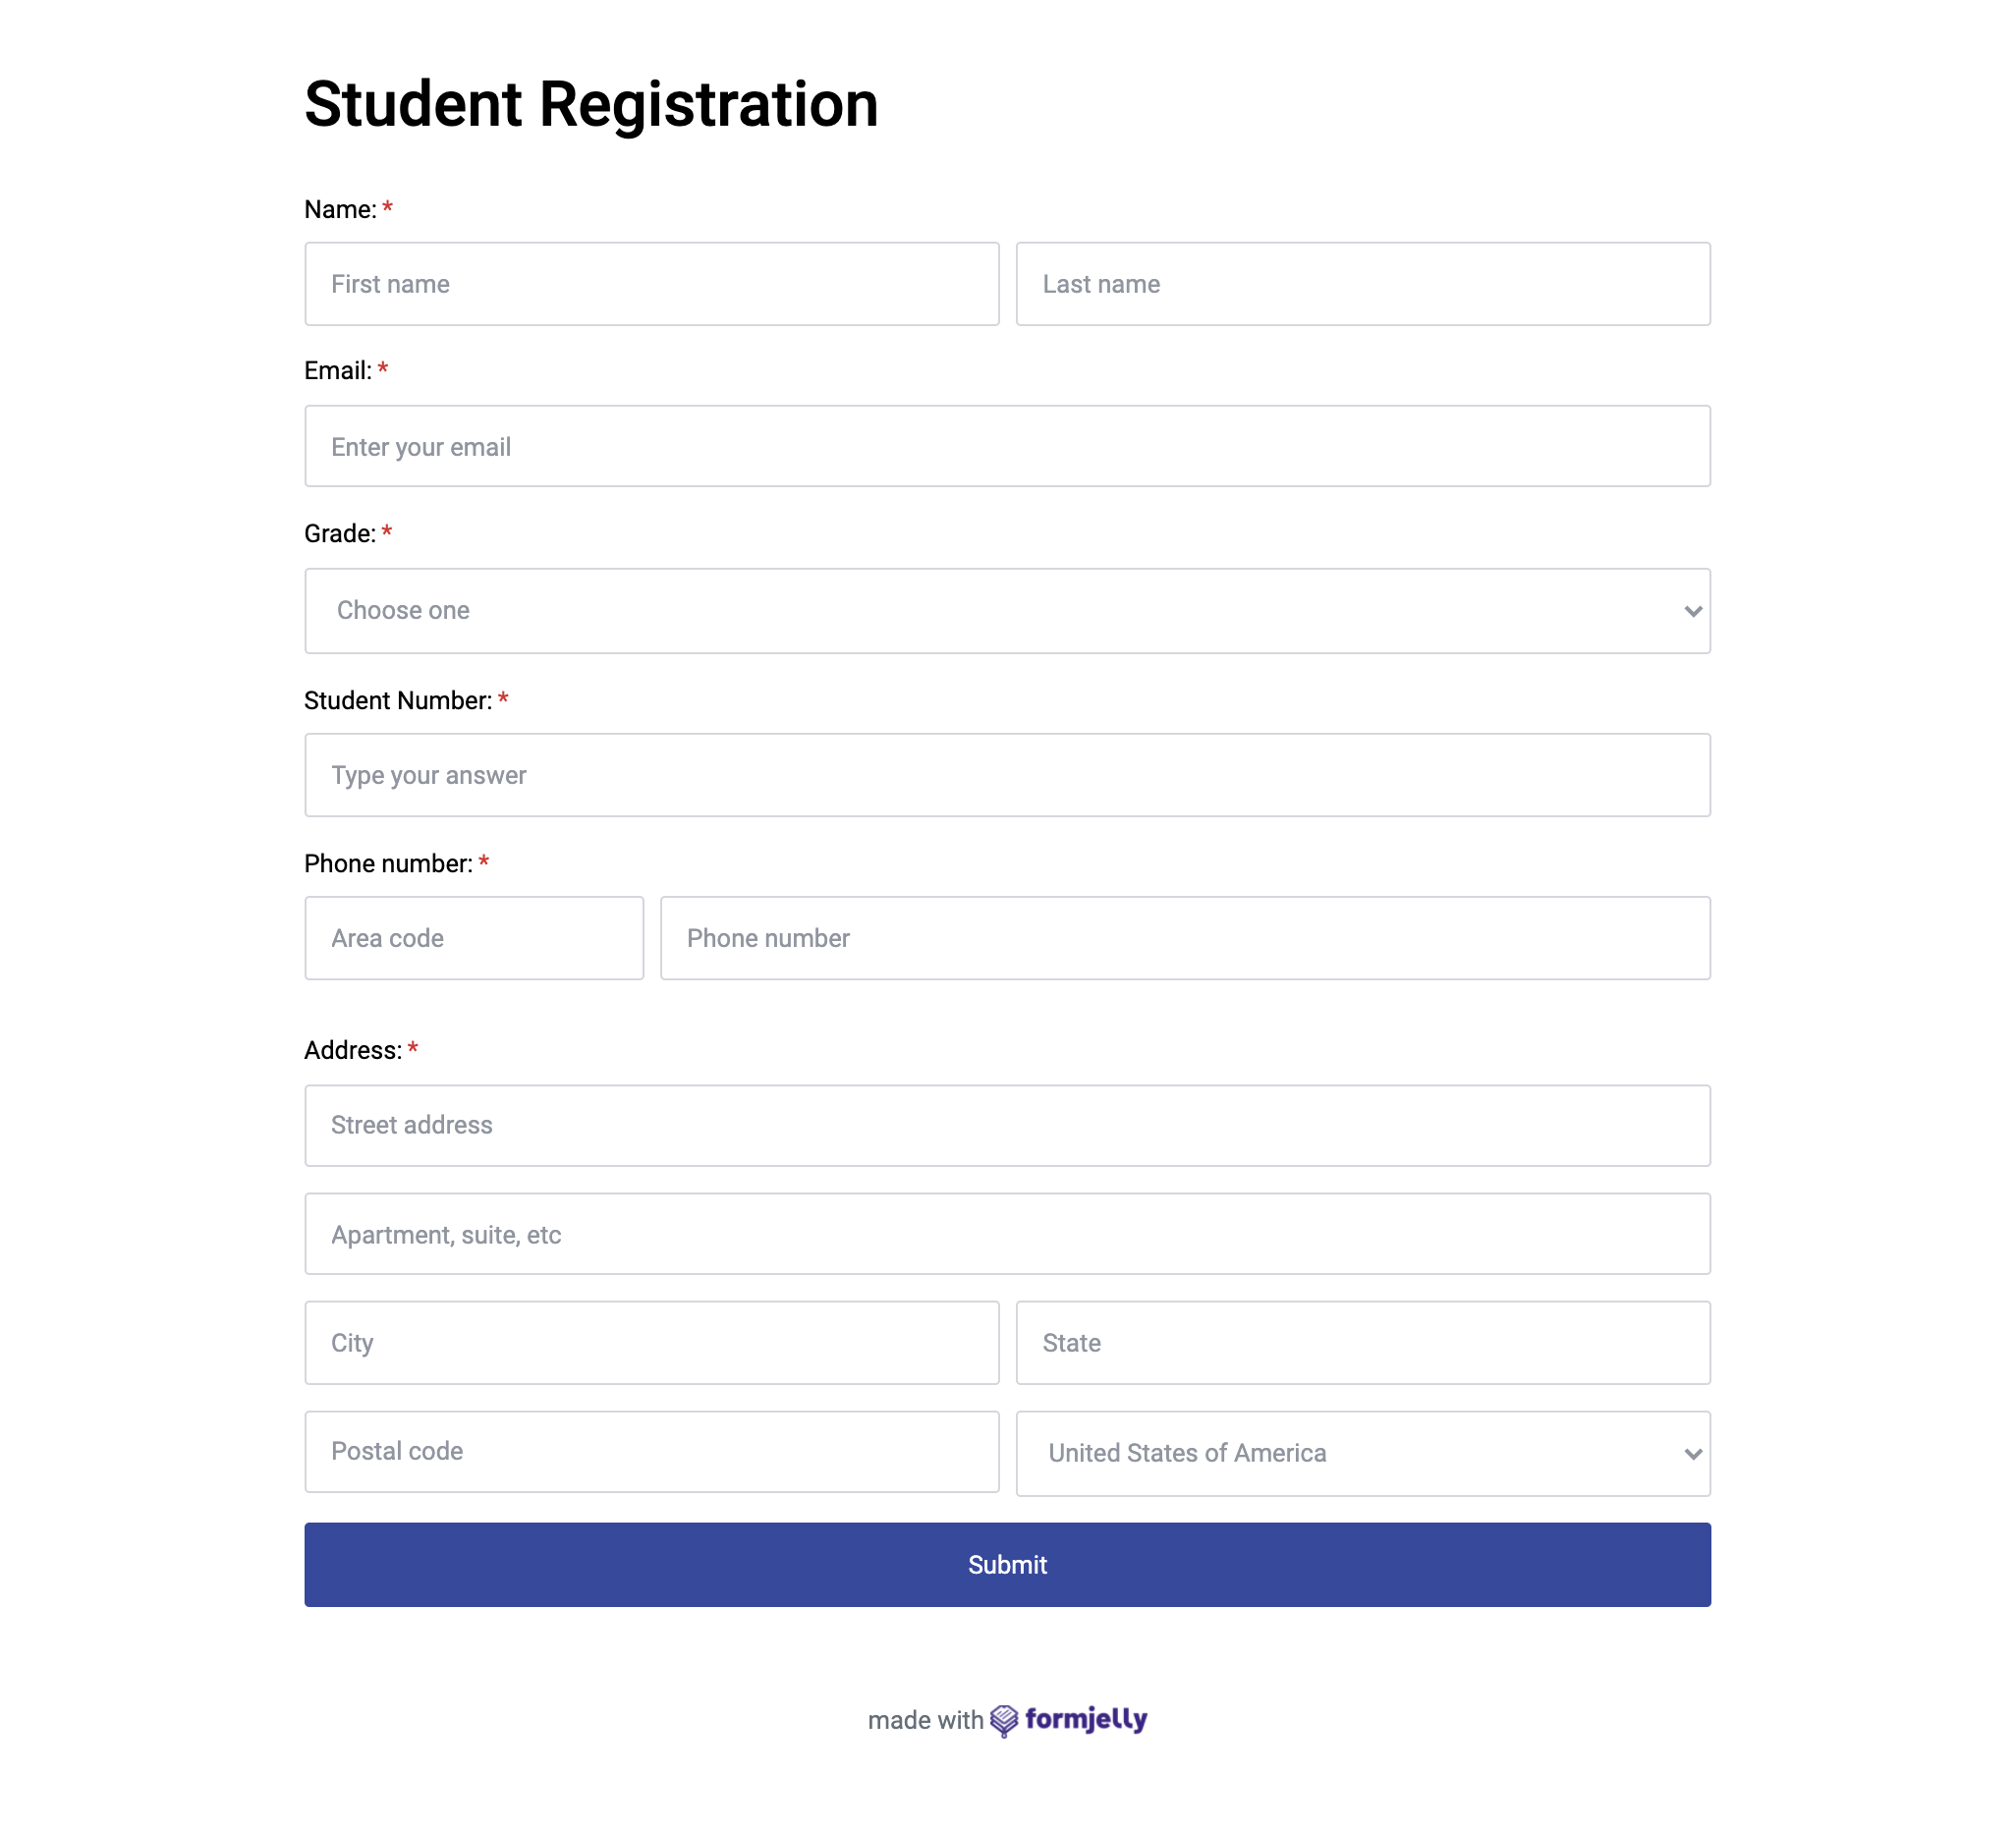 Student registration form template.